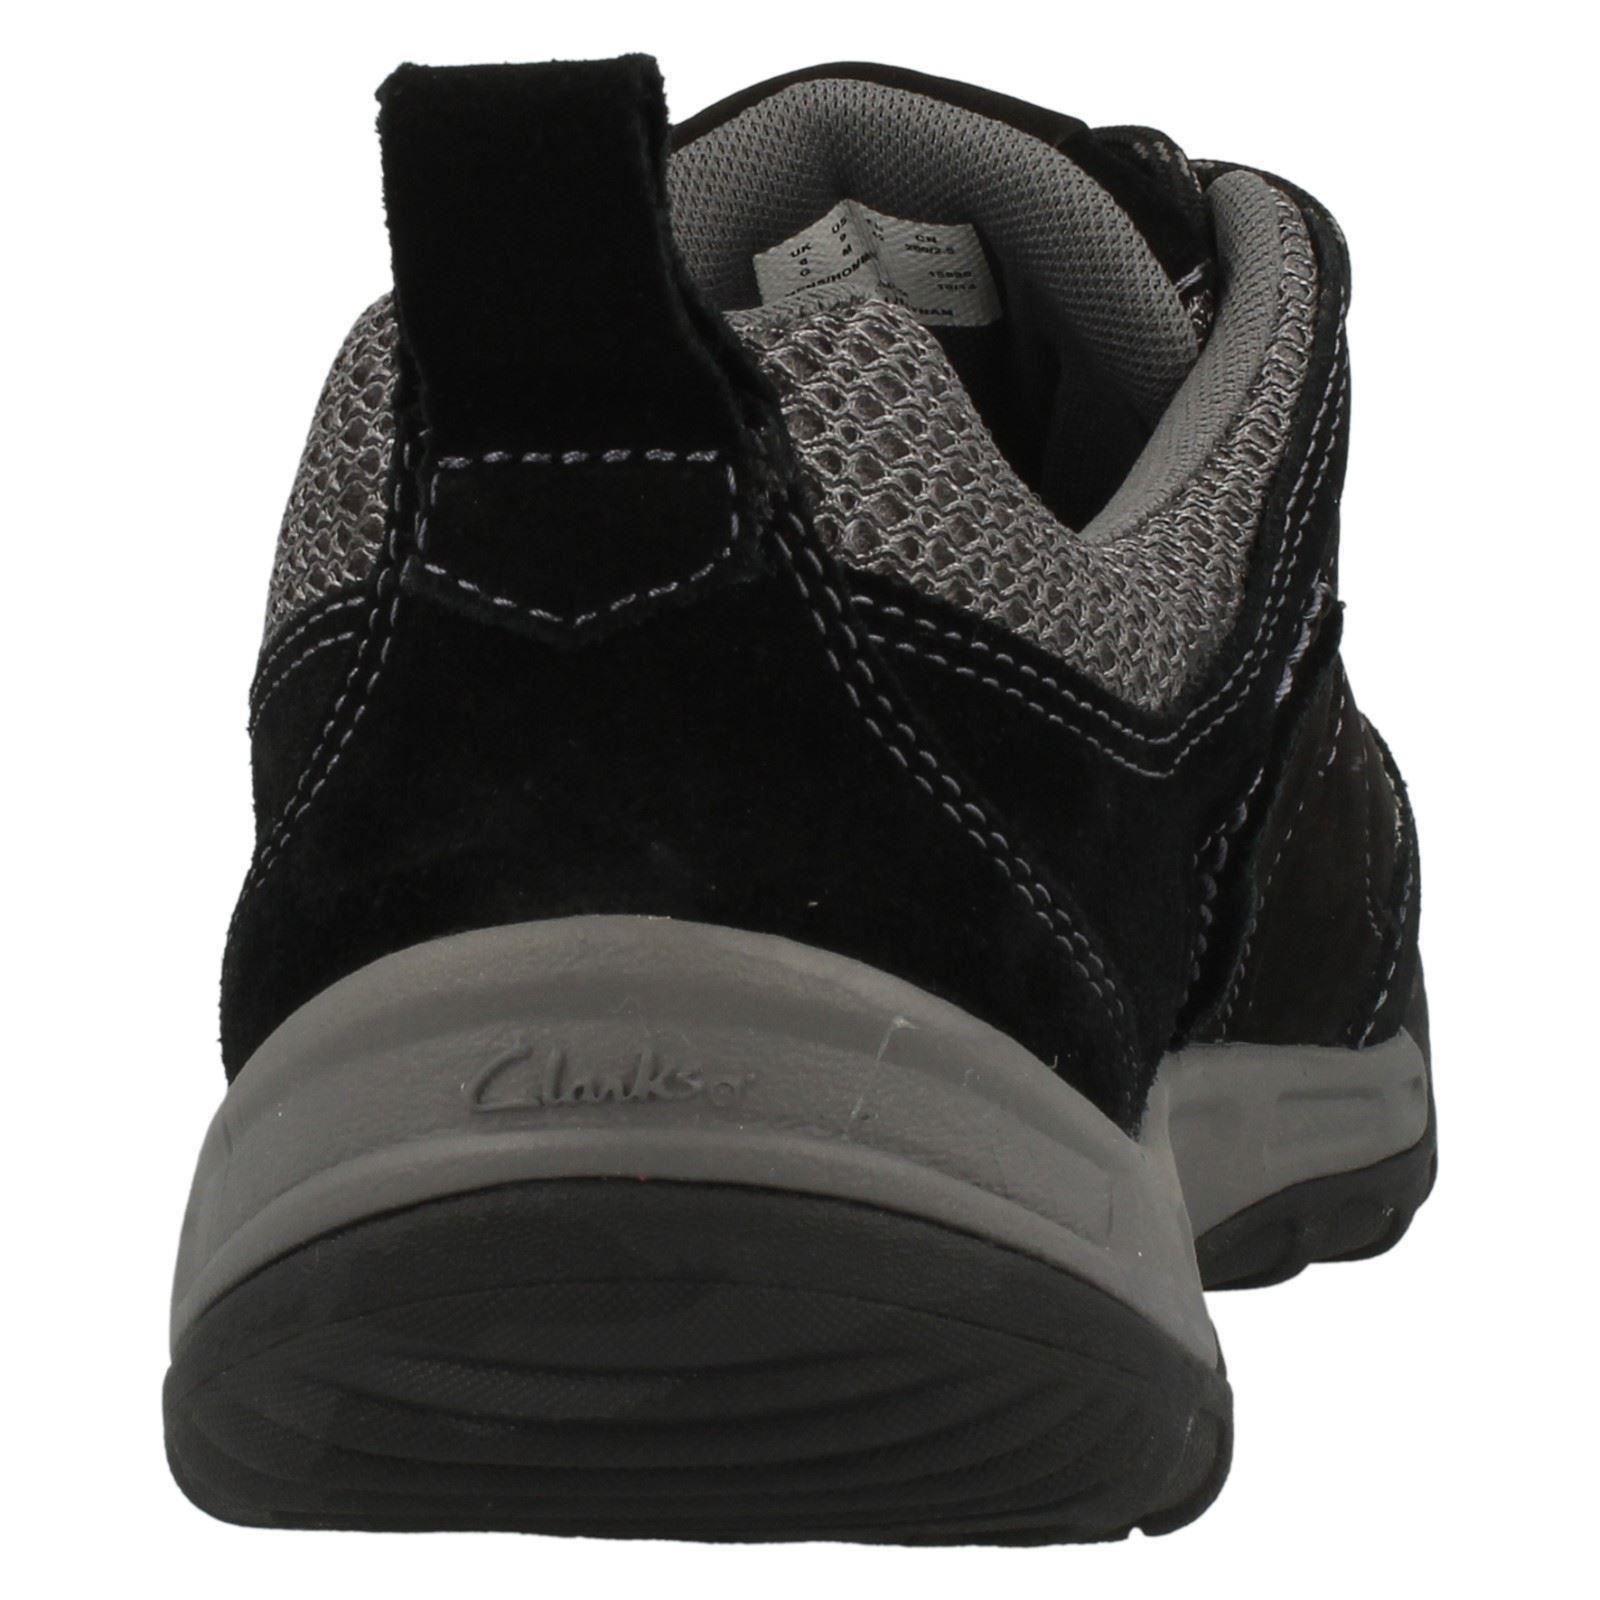 Mens Clarks Active Active Clarks Wear Trainers Outpass Lace 597c59